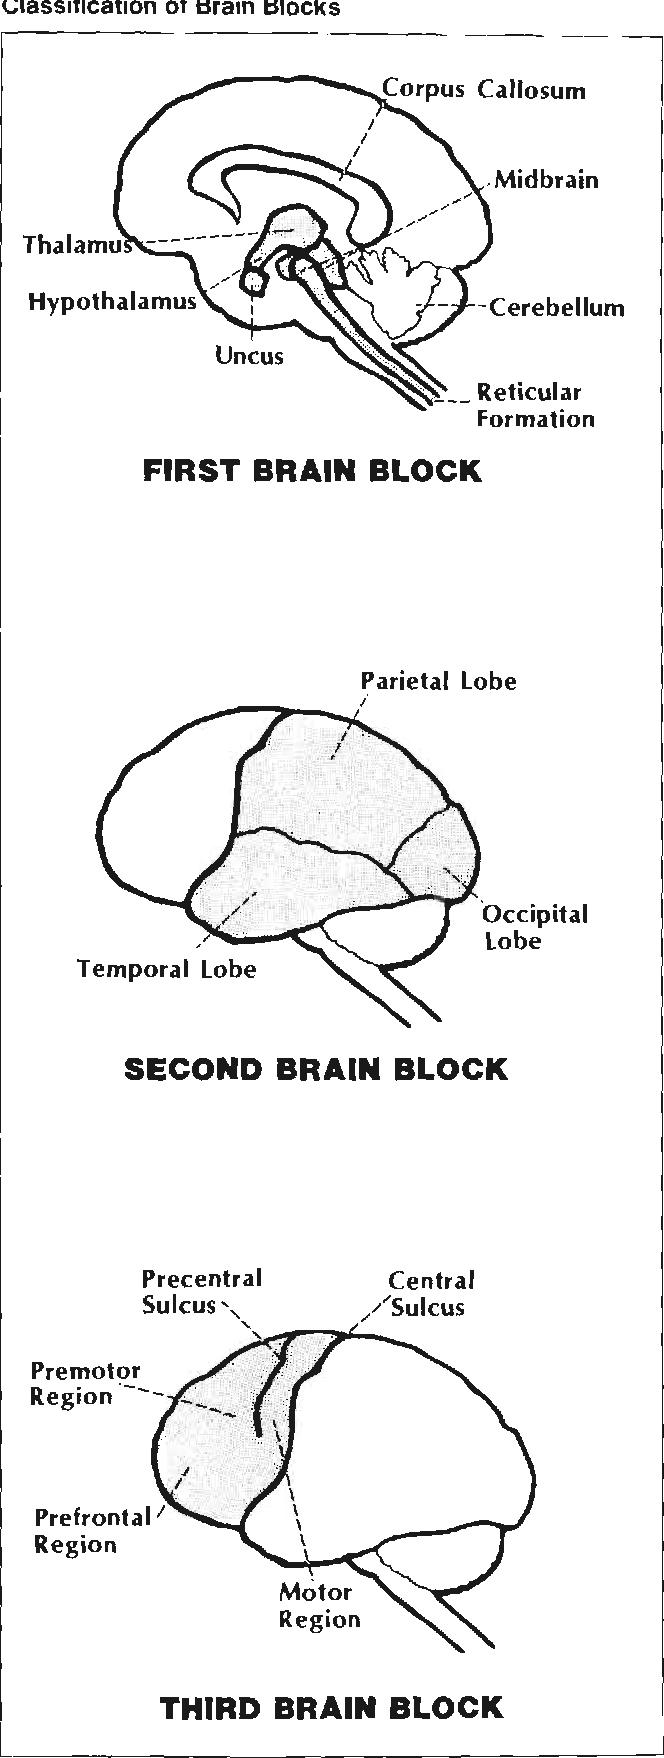 [PDF] Cognitive rehabilitation: a model for occupational